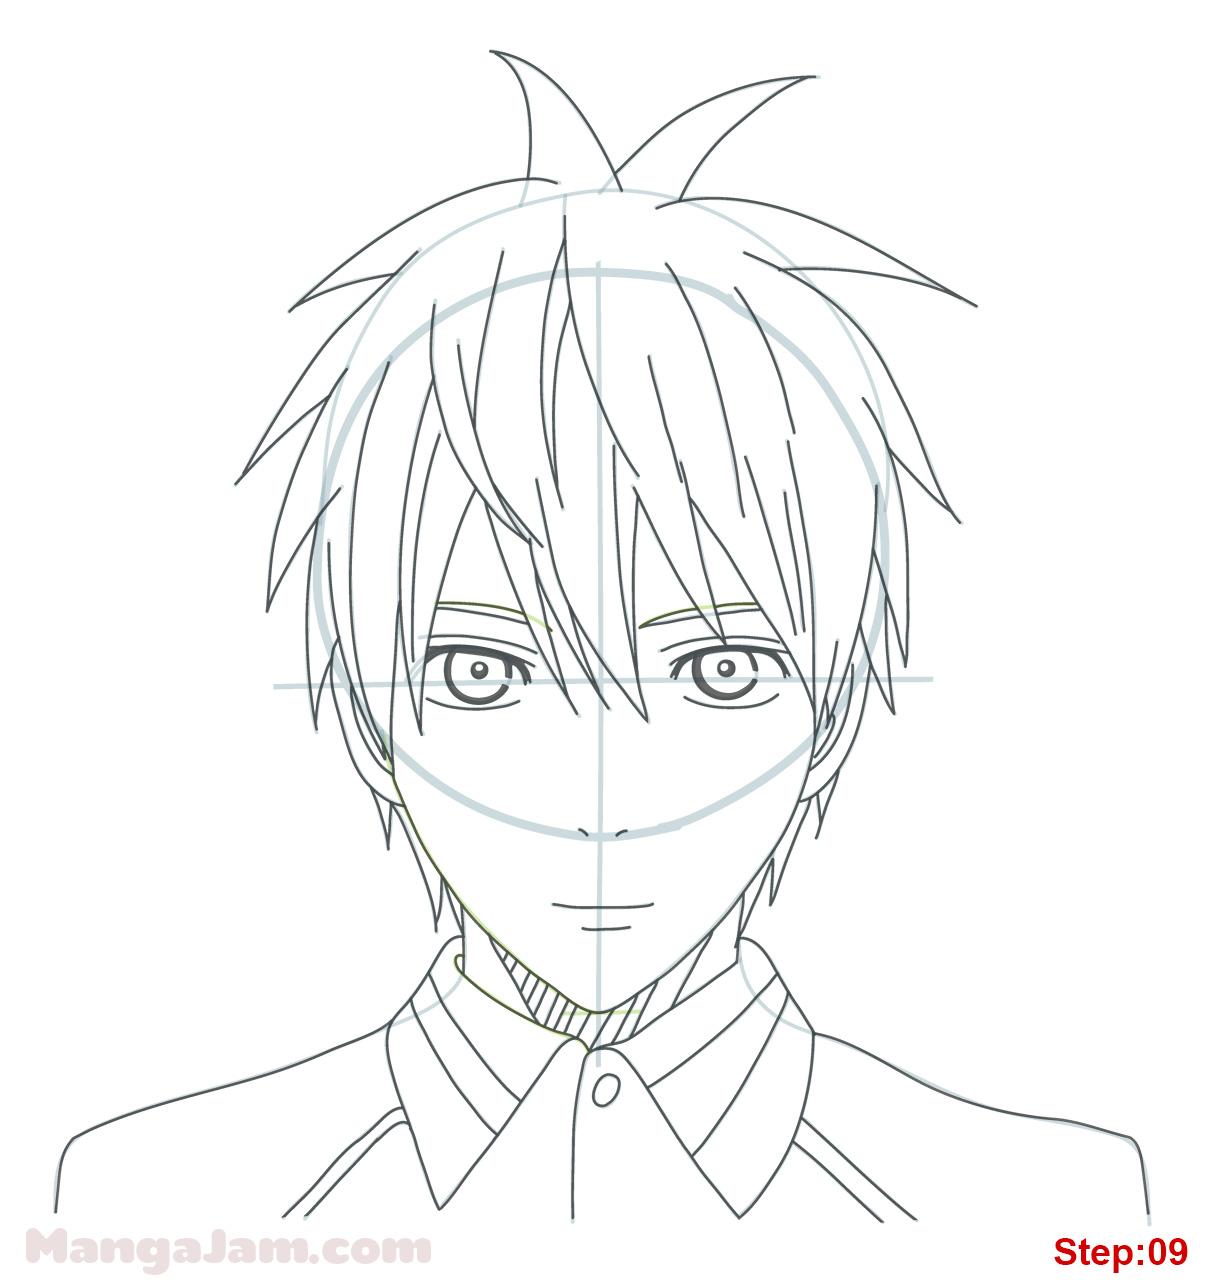 1209x1280 How To Draw Tetsuya From Kuroko No Basuke